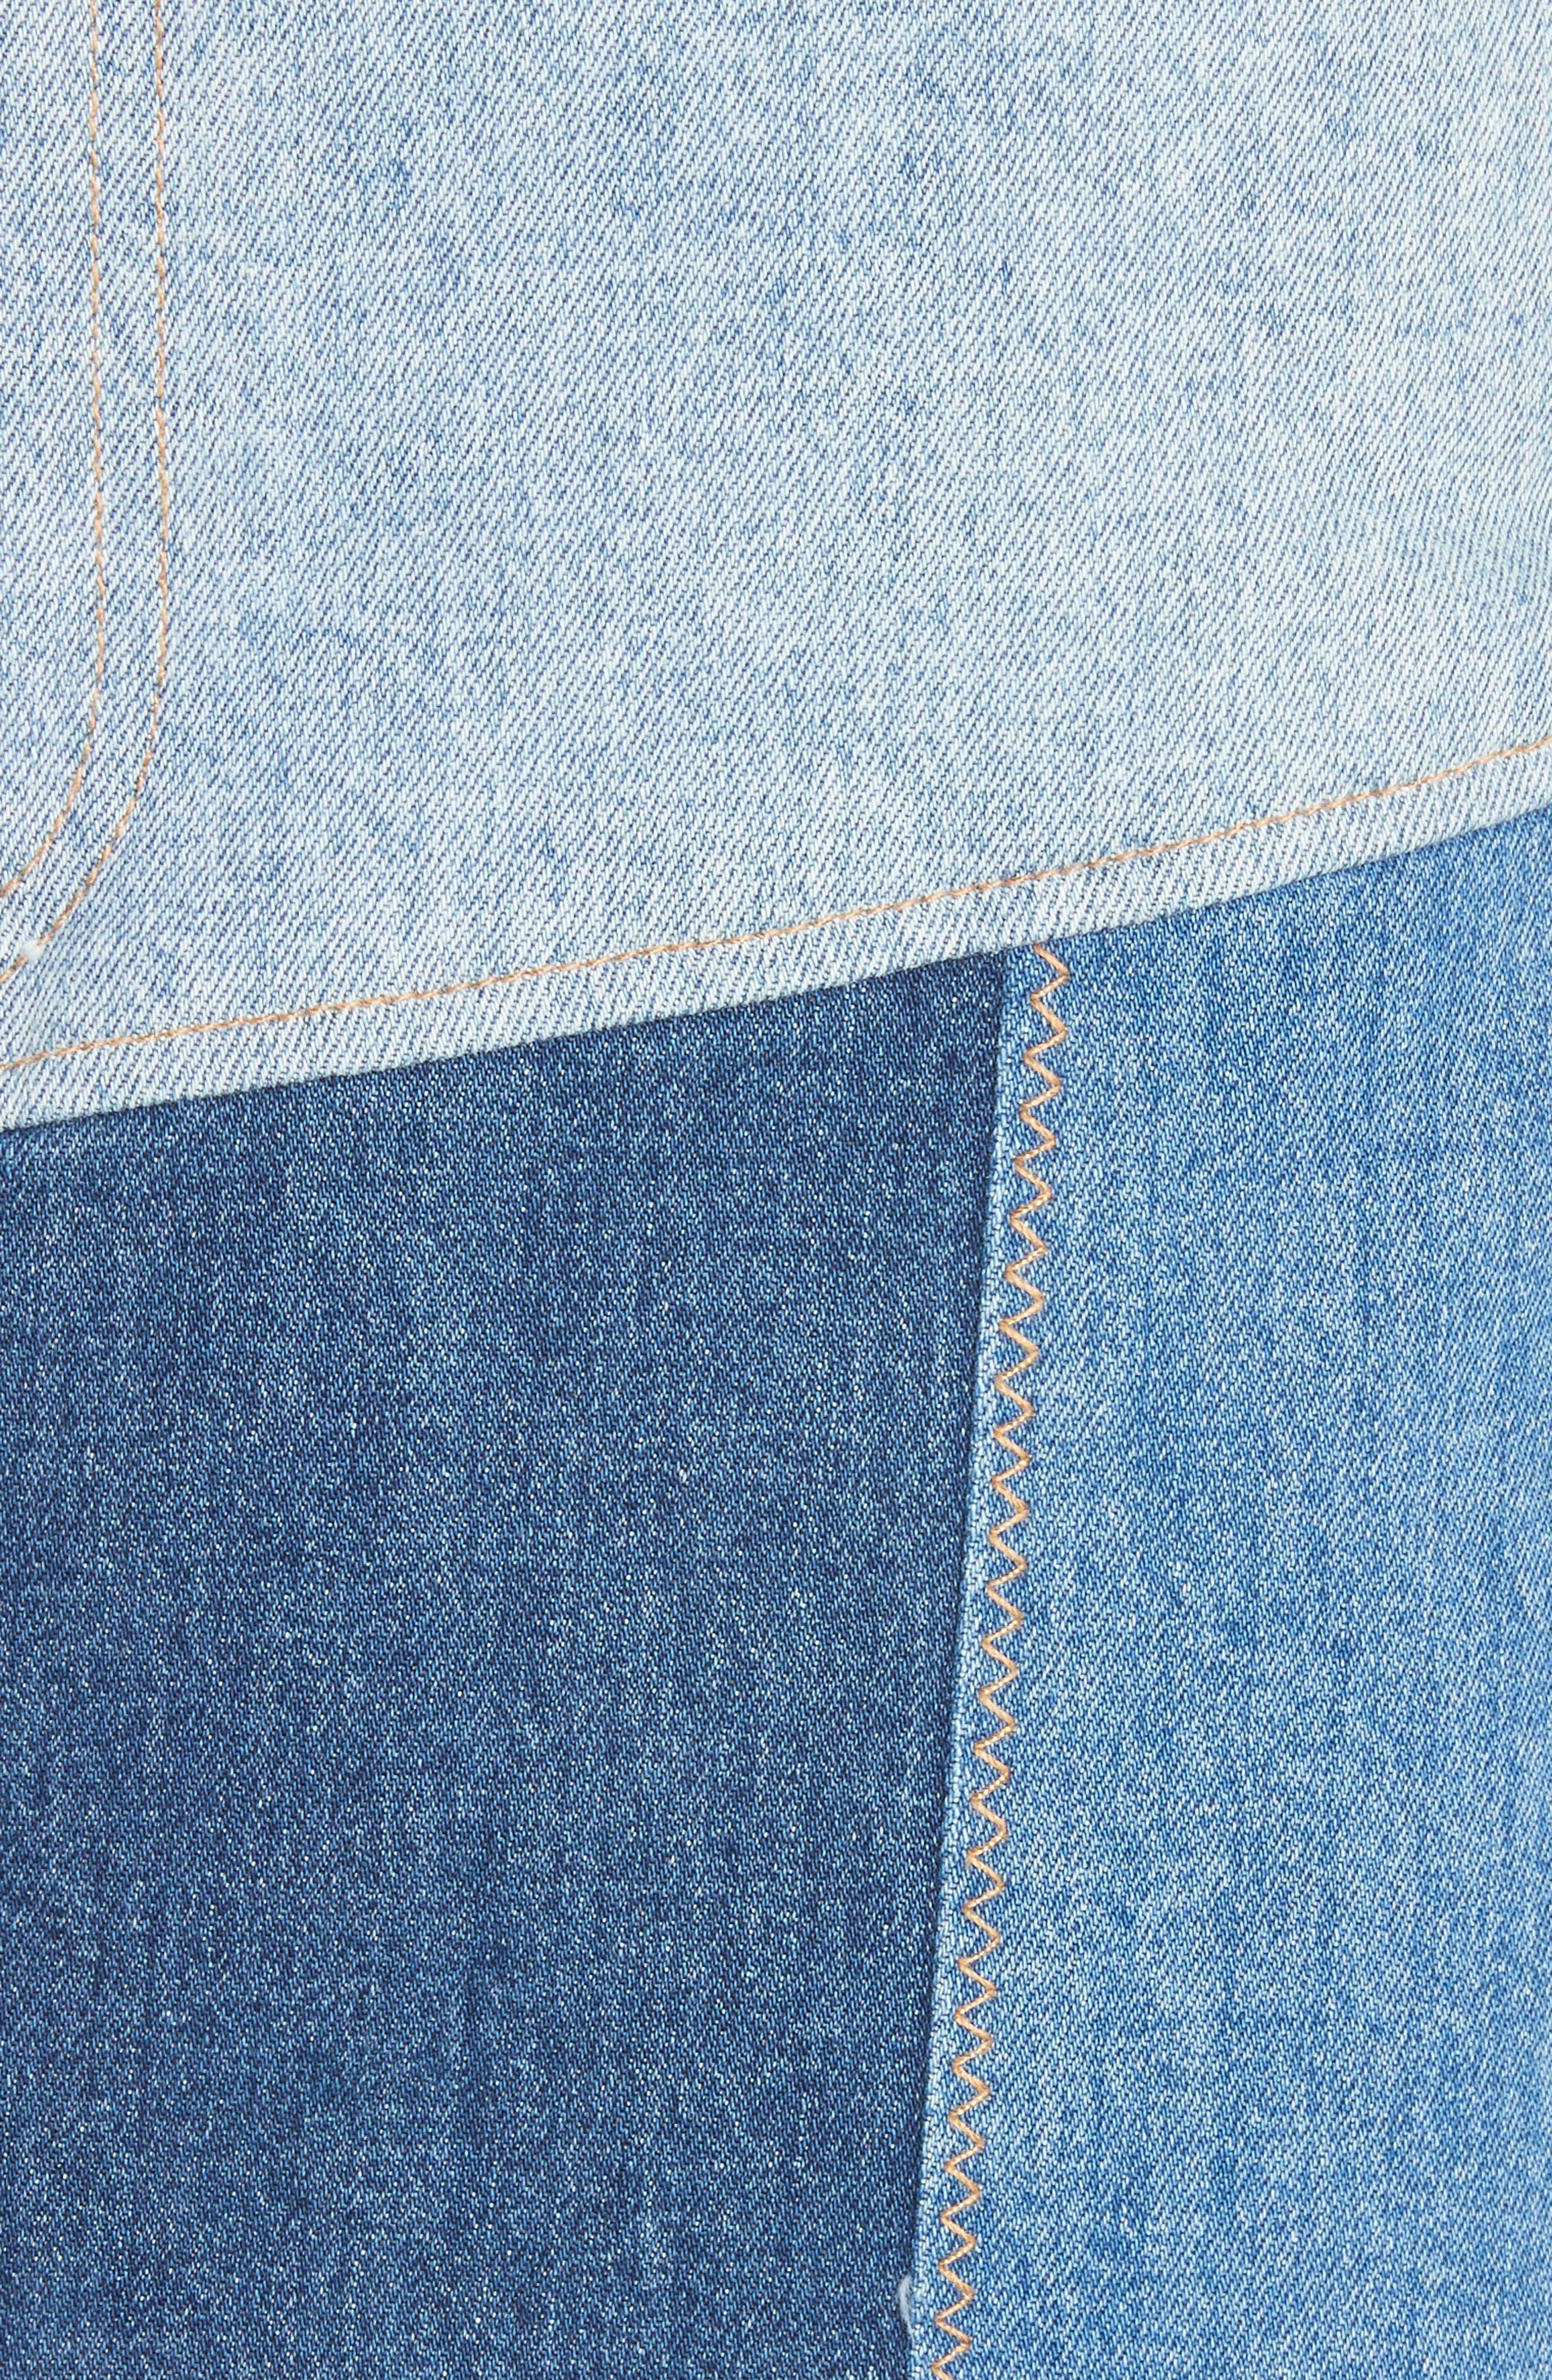 AO.LA Patchwork Denim Miniskirt,                             Alternate thumbnail 5, color,                             485